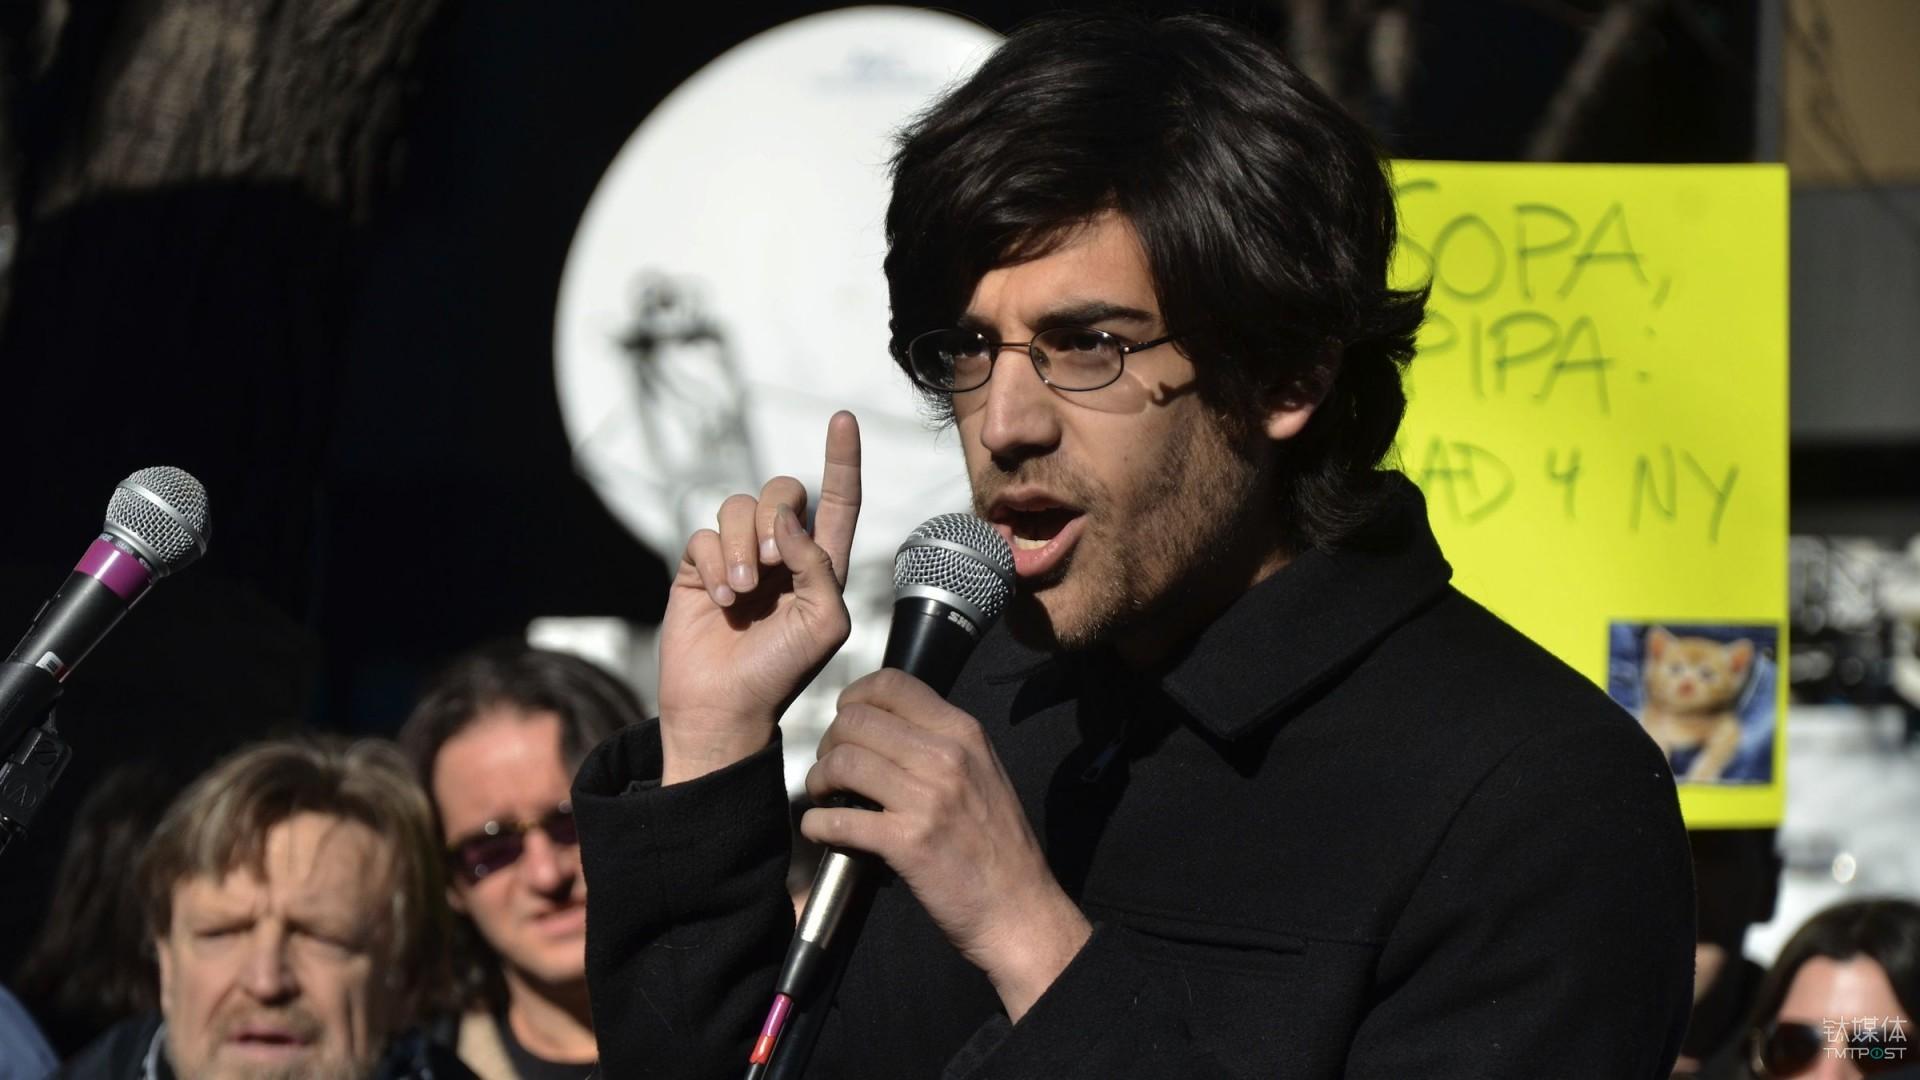 斯沃茨在2012年一次反对 SOPA 的活动上 Daniel Sieradski, via Wikimedia Commons 来源:qz